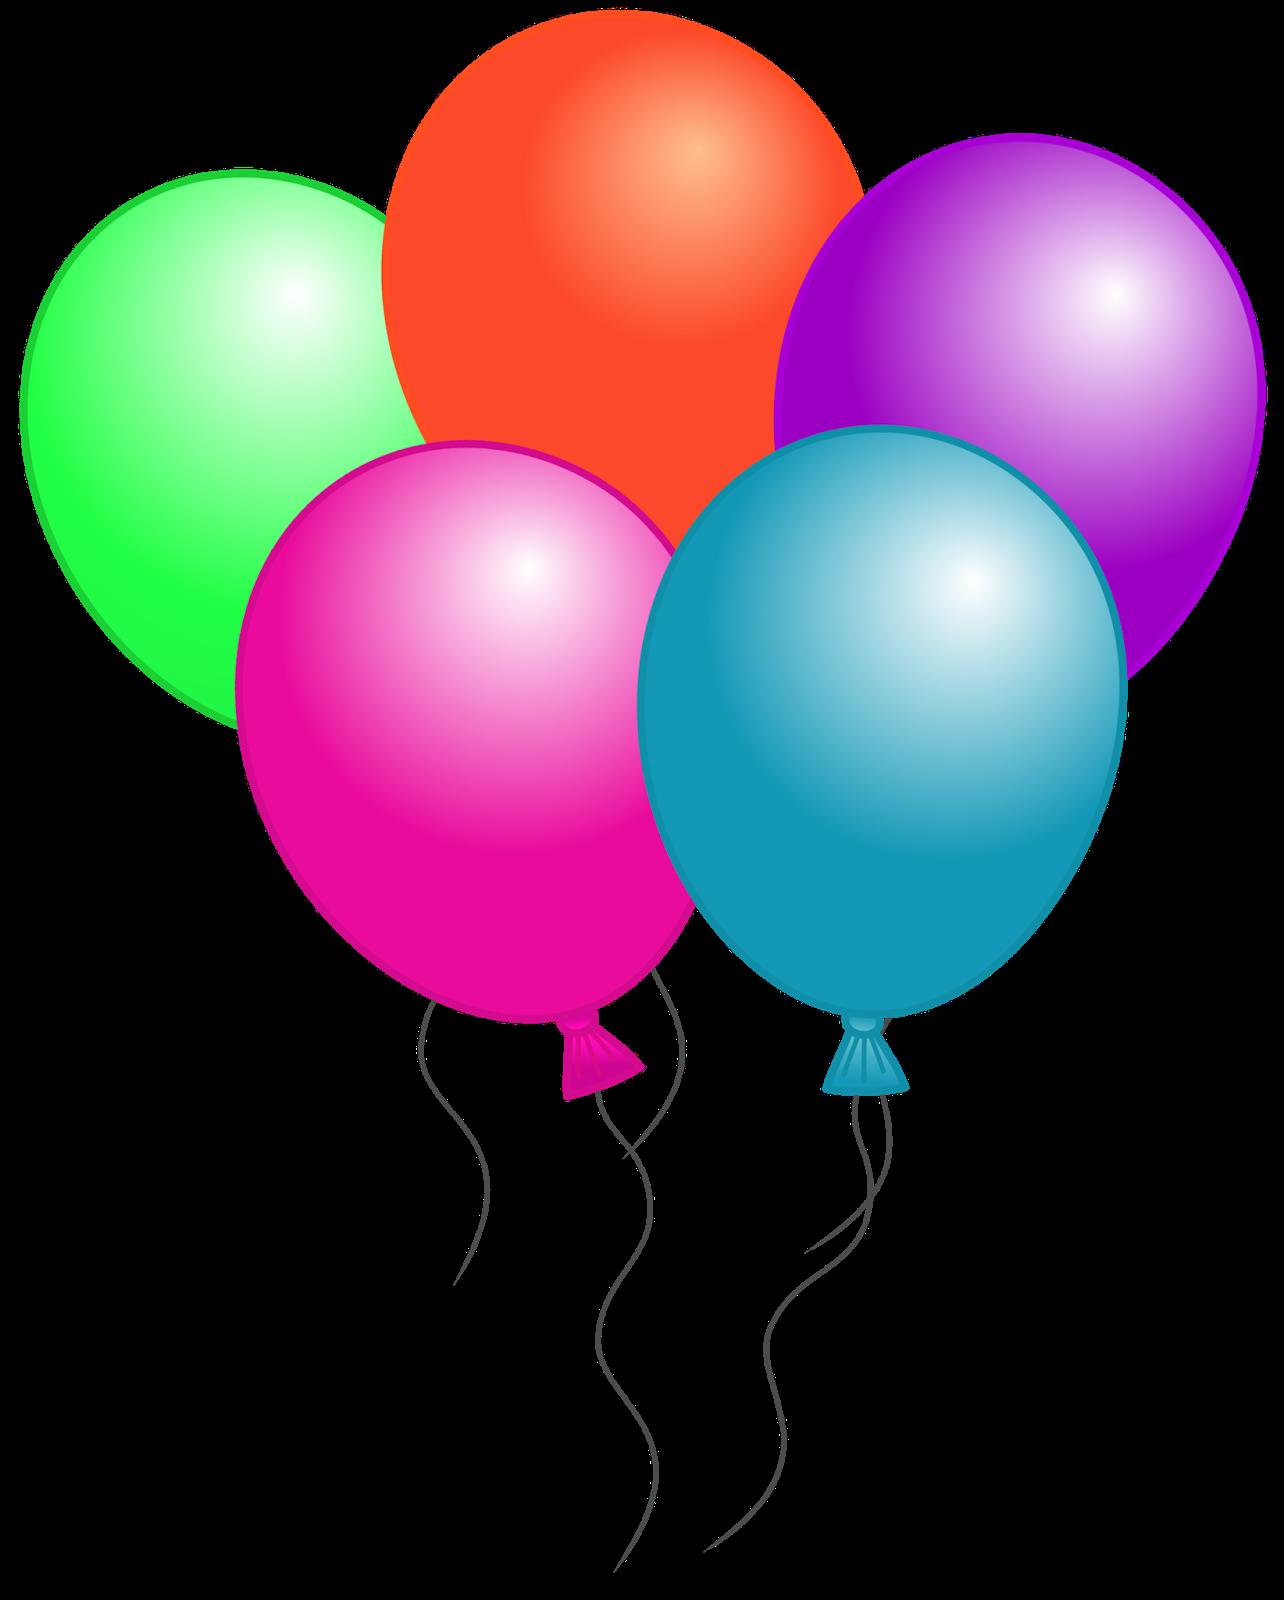 1284x1600 57 Free Balloon Clipart